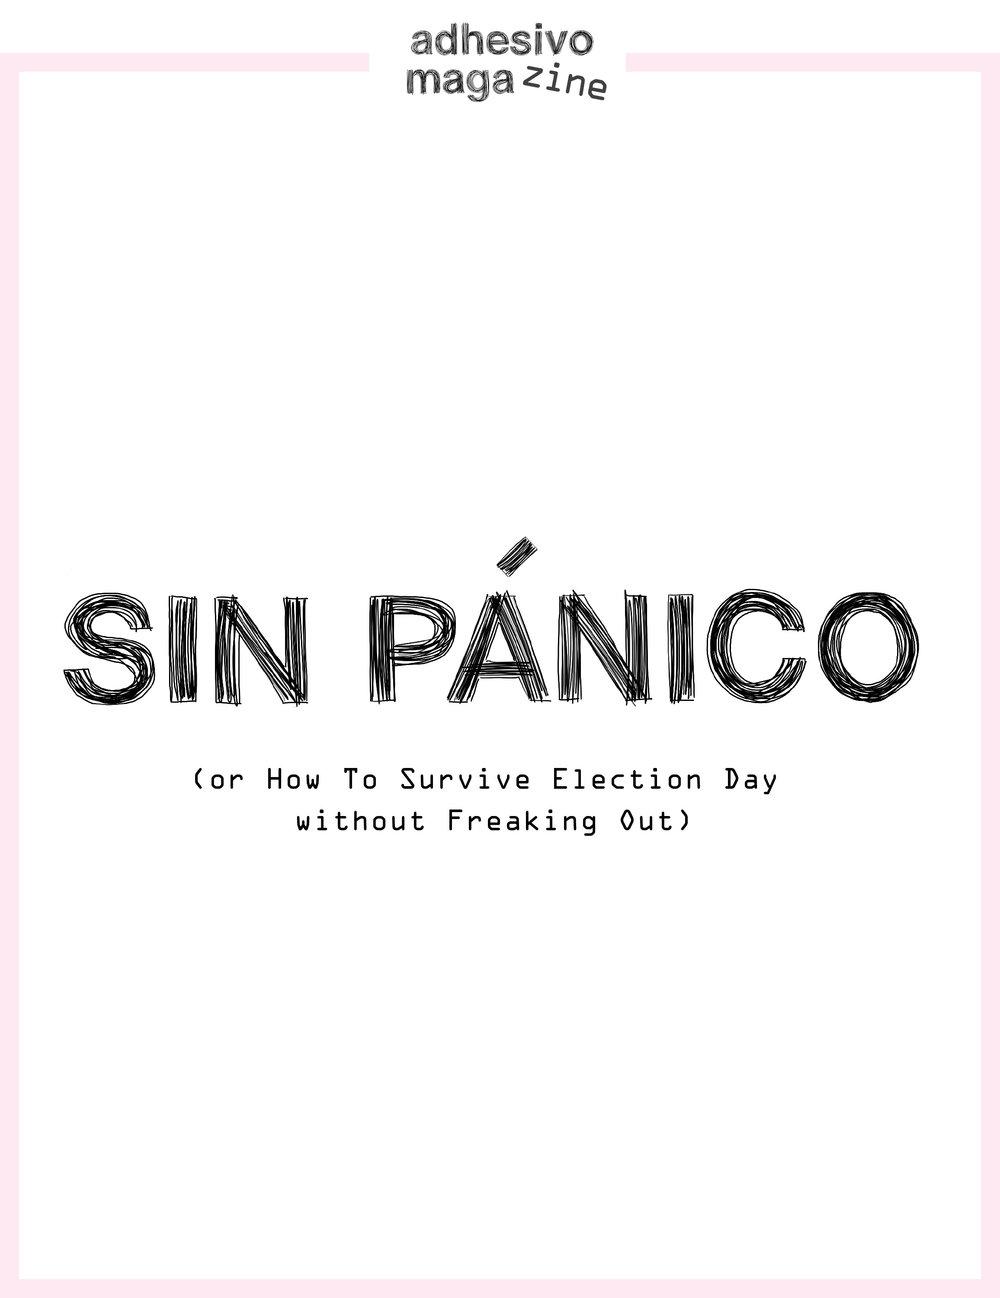 SinPánico_byadhesivo (1)-1.jpg